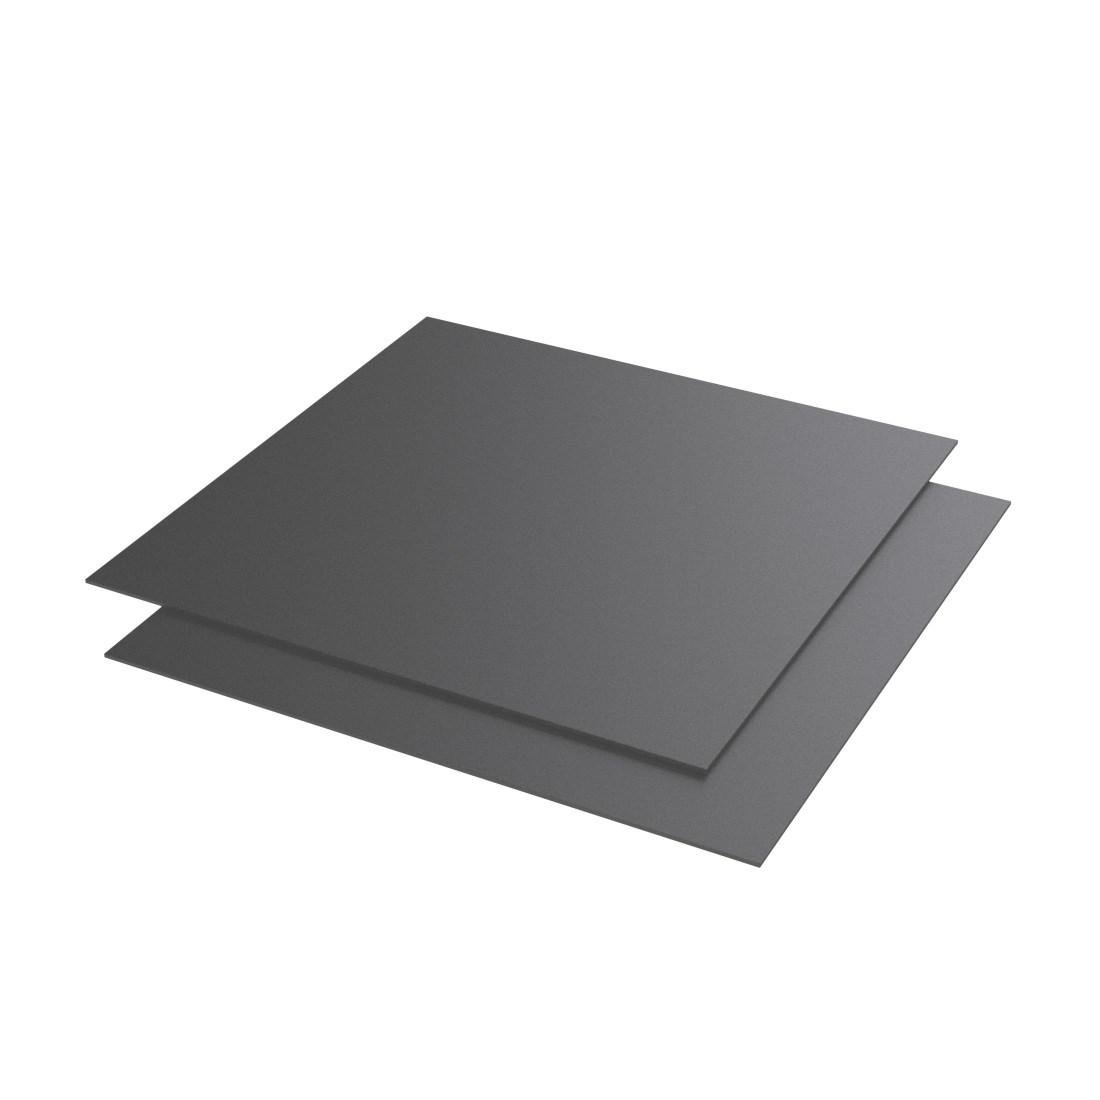 Vikunyl PVC Grijs 9270 Mat 1300x1000x0,2mm